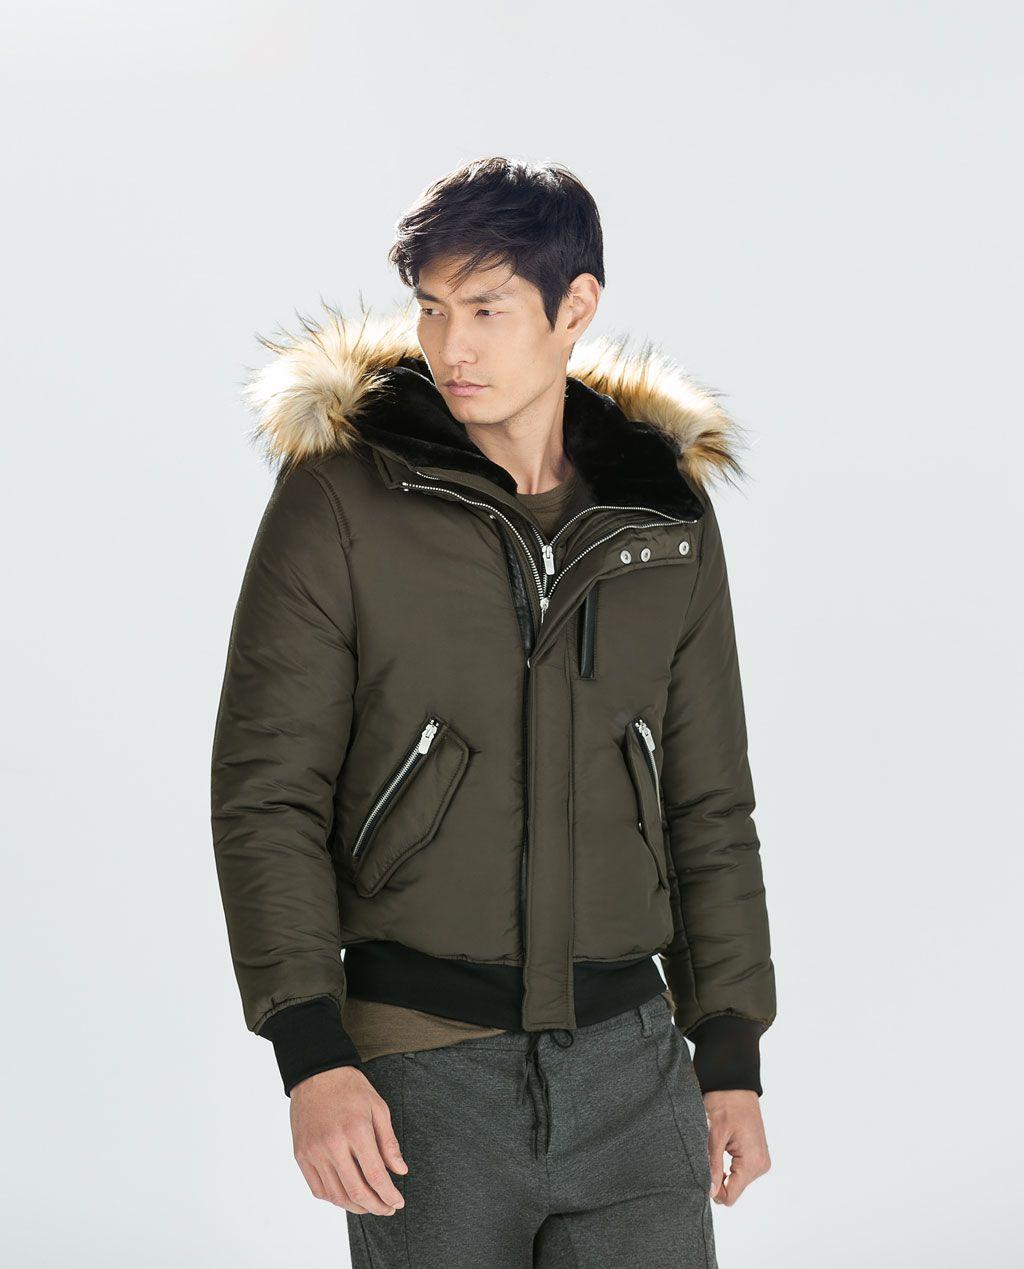 Zara Man Jacket With Fur Hood Zara Man Jacket Fur Hood Jacket Jackets [ 1269 x 1024 Pixel ]